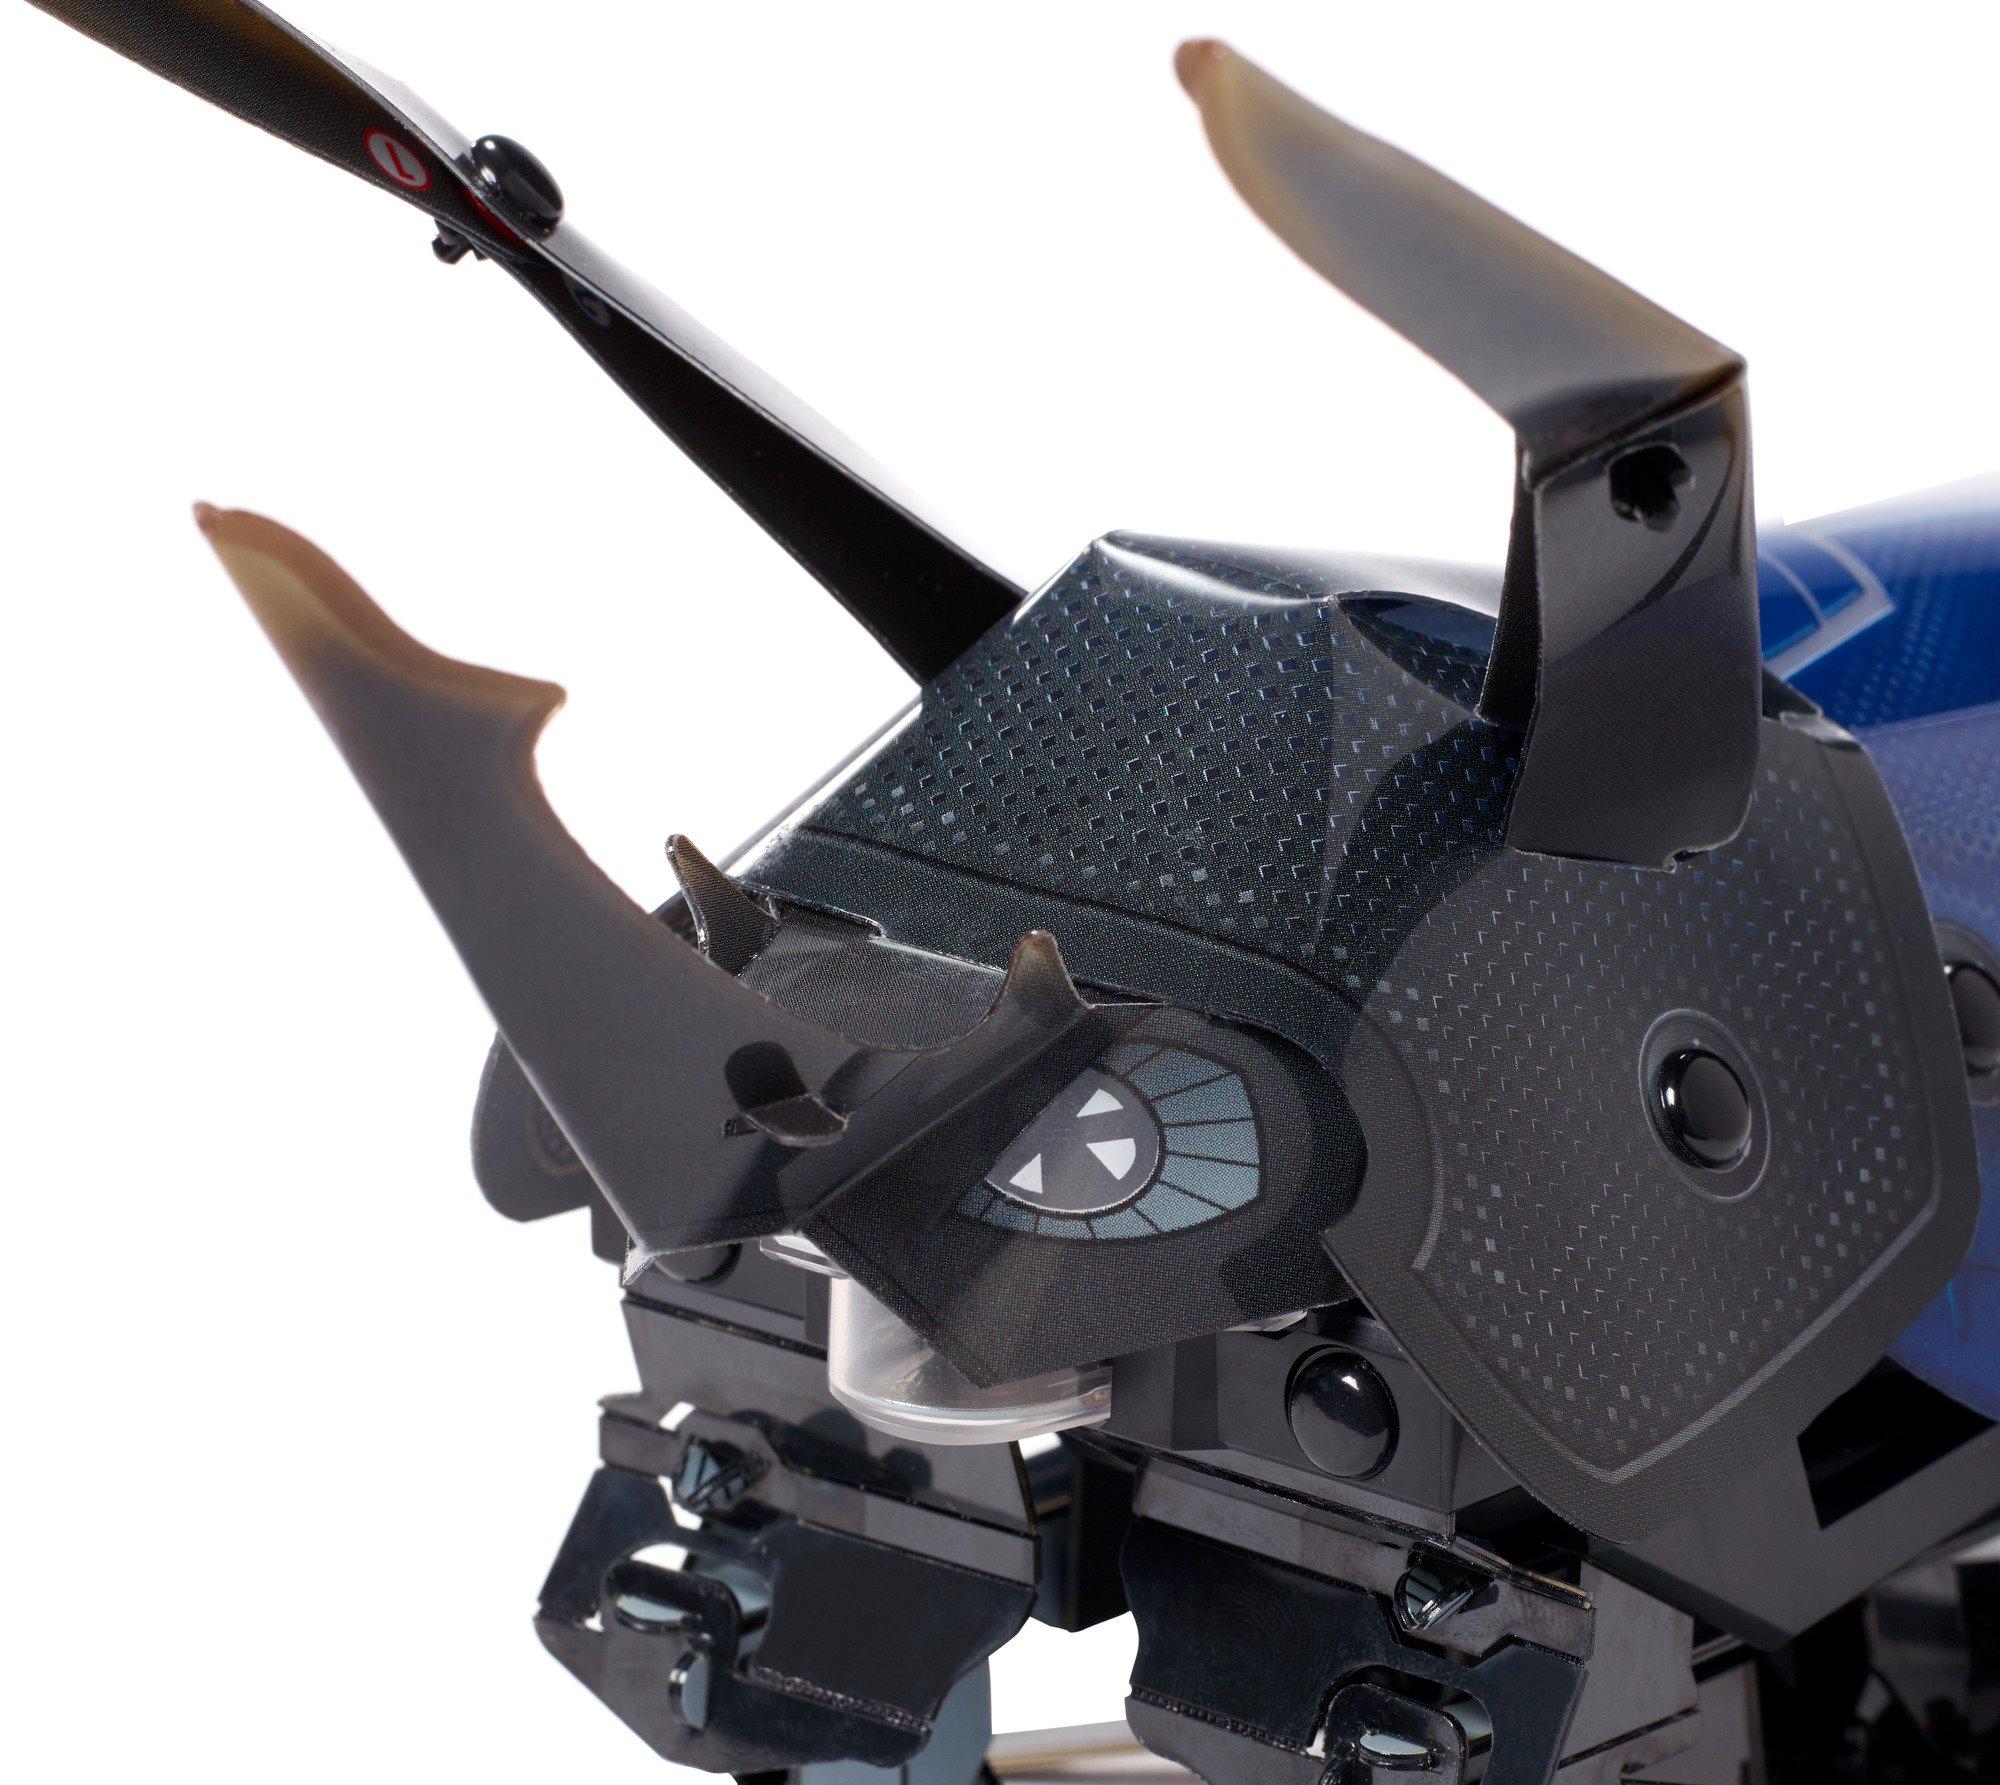 Kamigami Atlasar Robot by Mattel (Image #12)